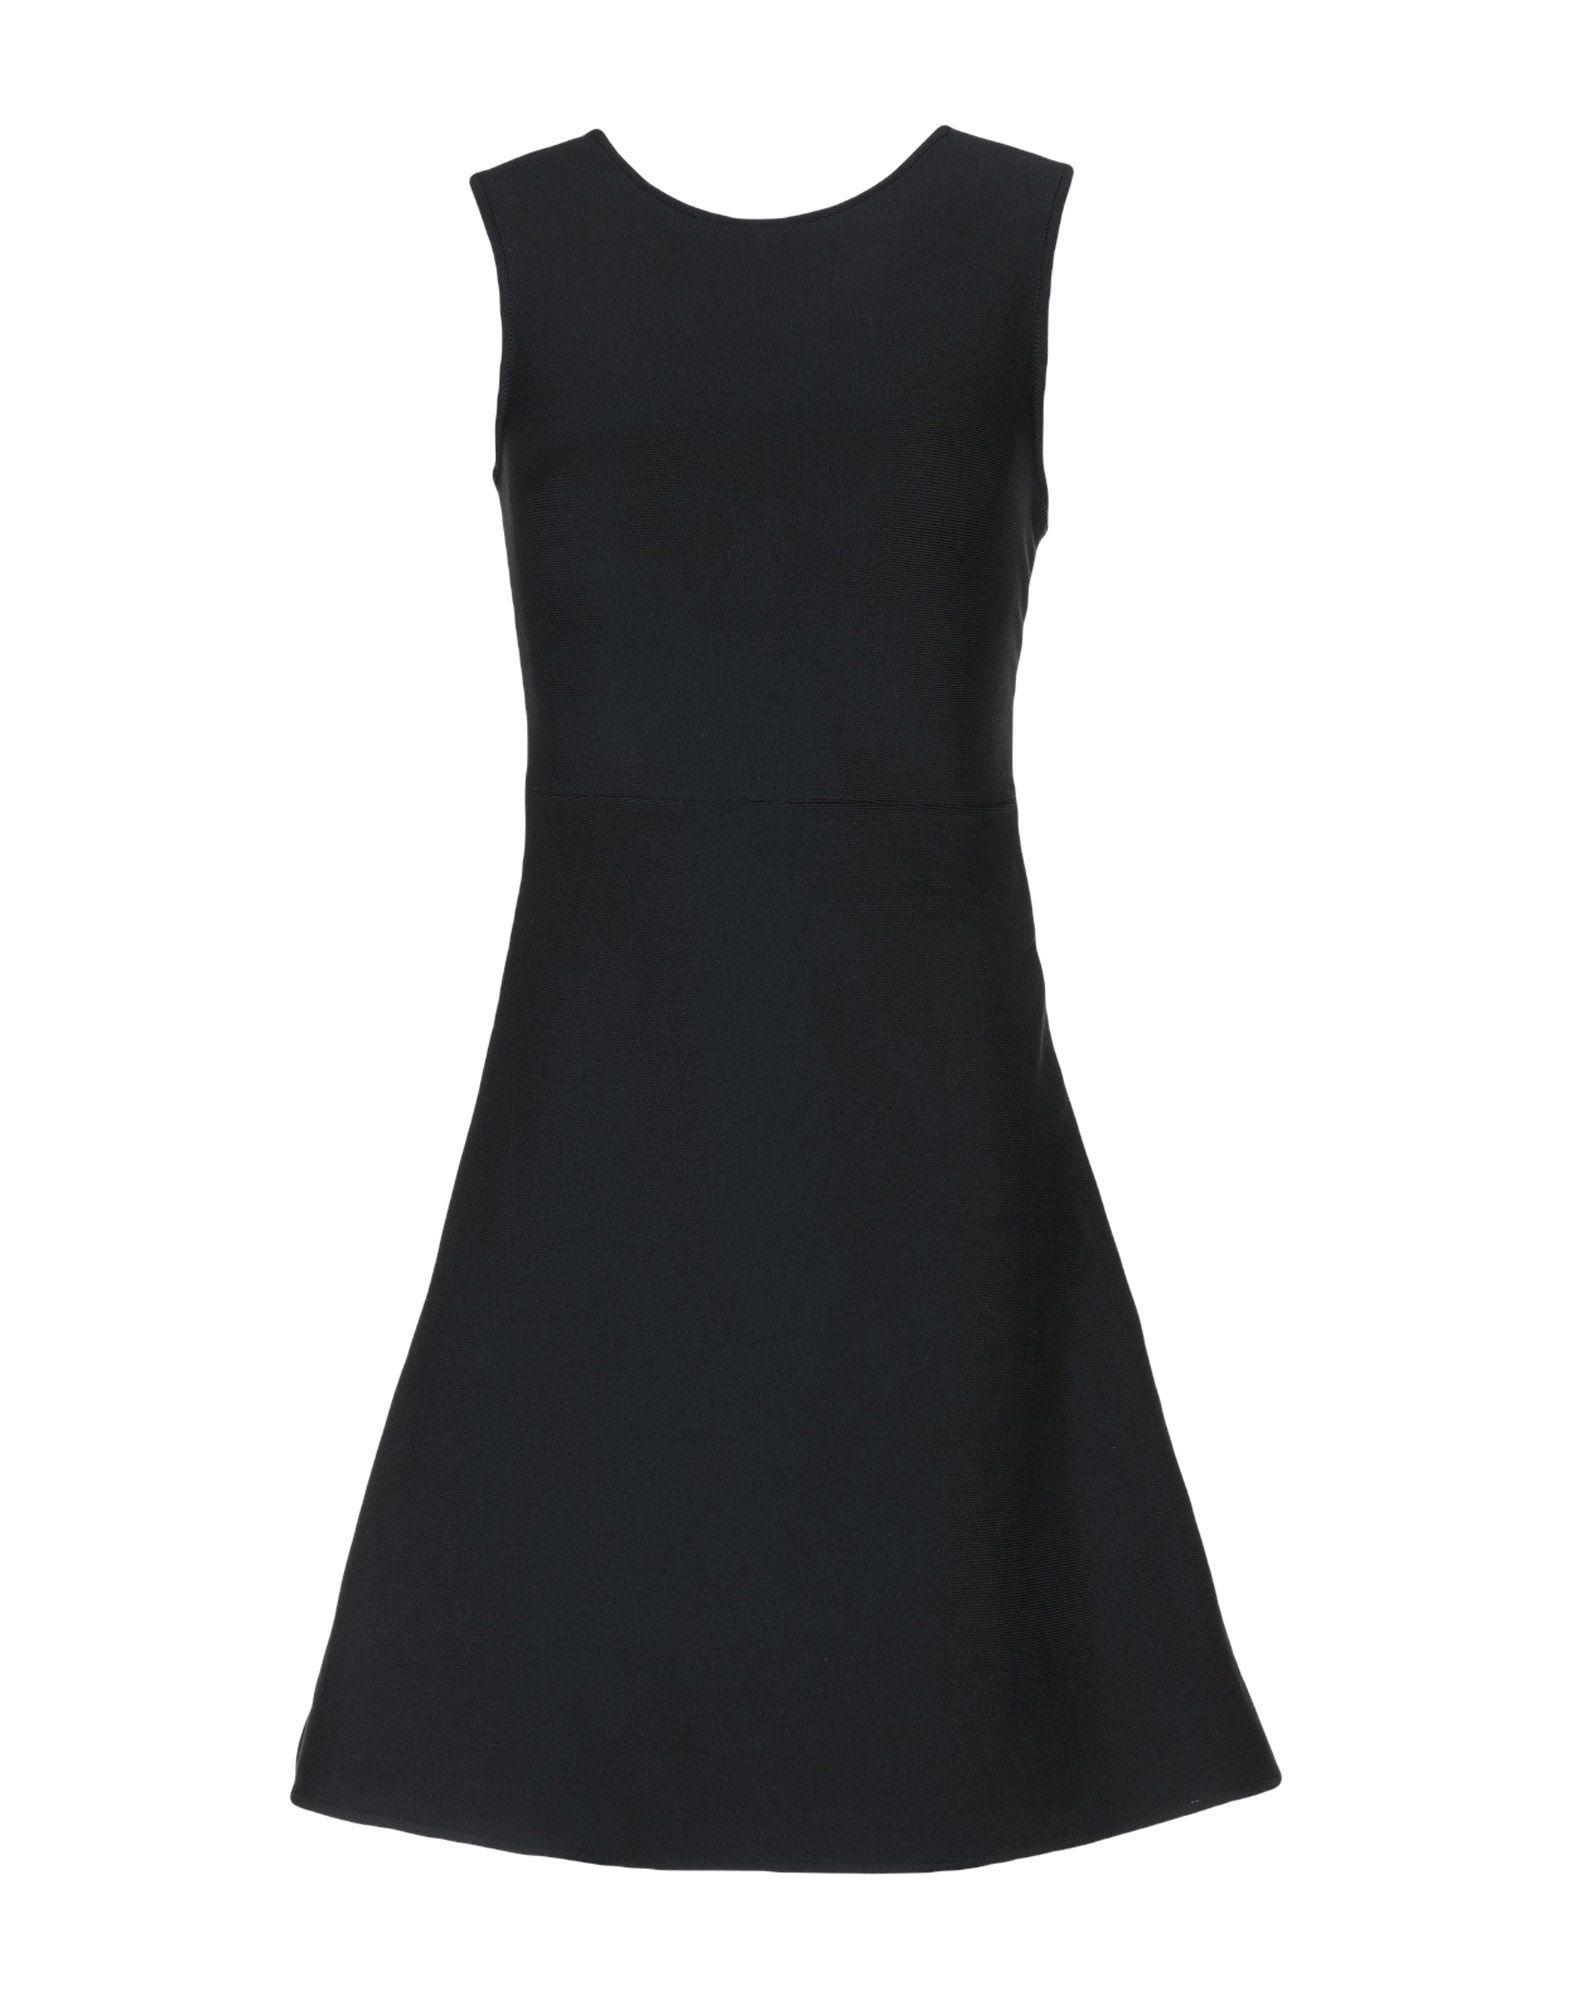 Odi Et Amo Black Sleeveless Dress